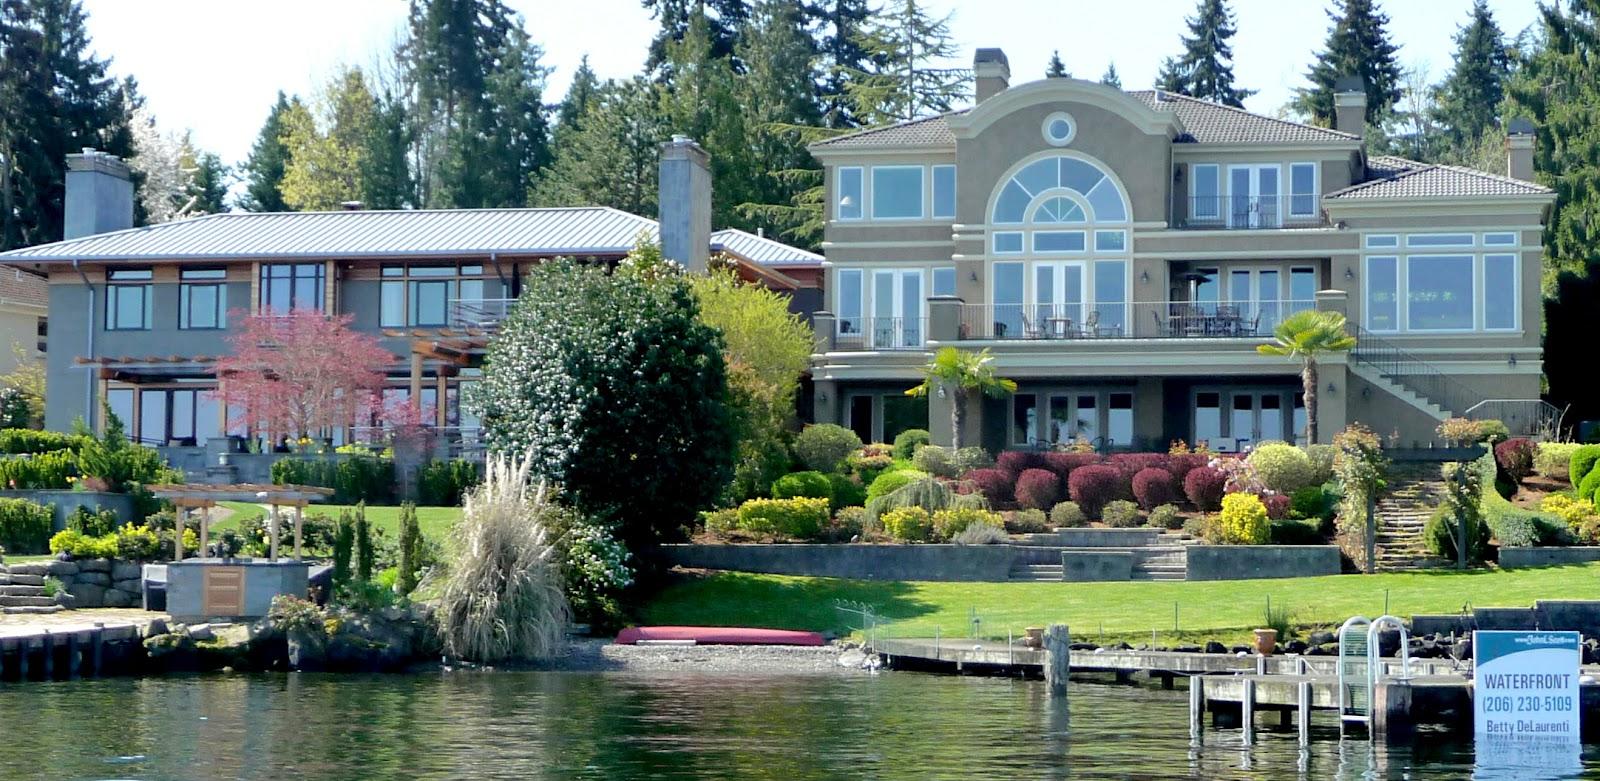 Mercer island luxury waterfront estate idesignarch interior design - Seattle Mansions Multimillion Mercer Island Homes Discounted